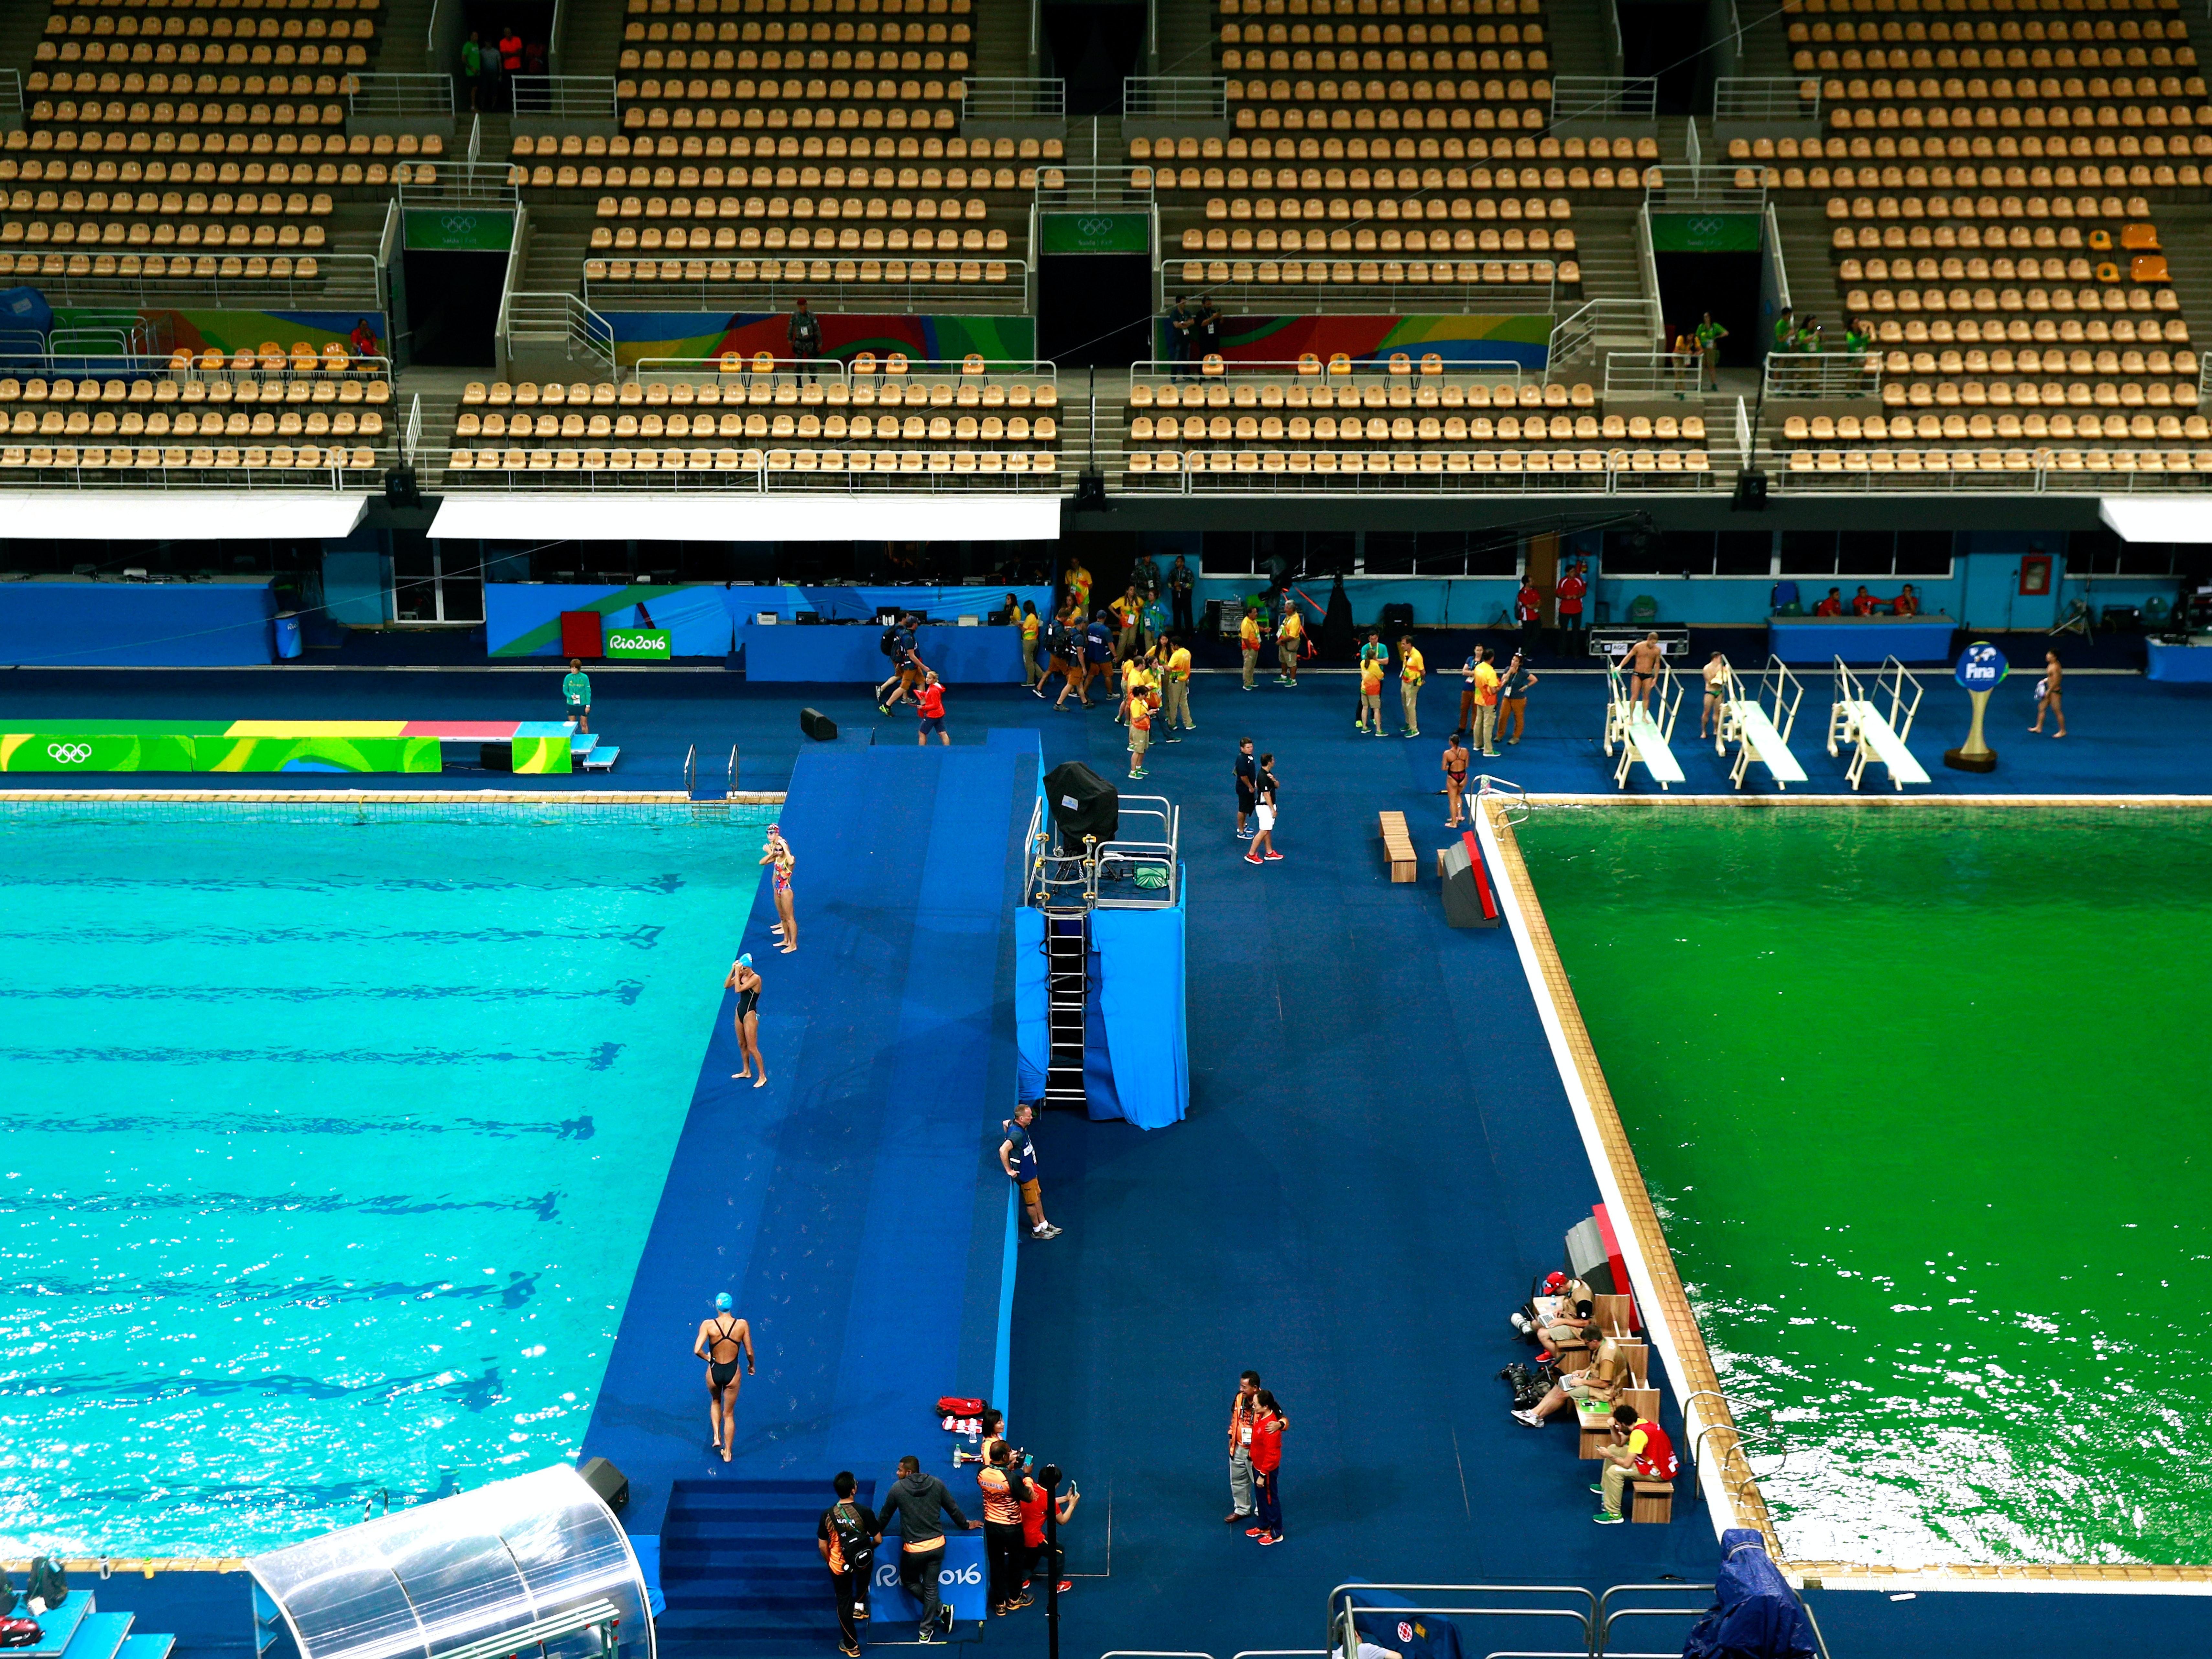 One pool, two pool, green pool, blue pool.